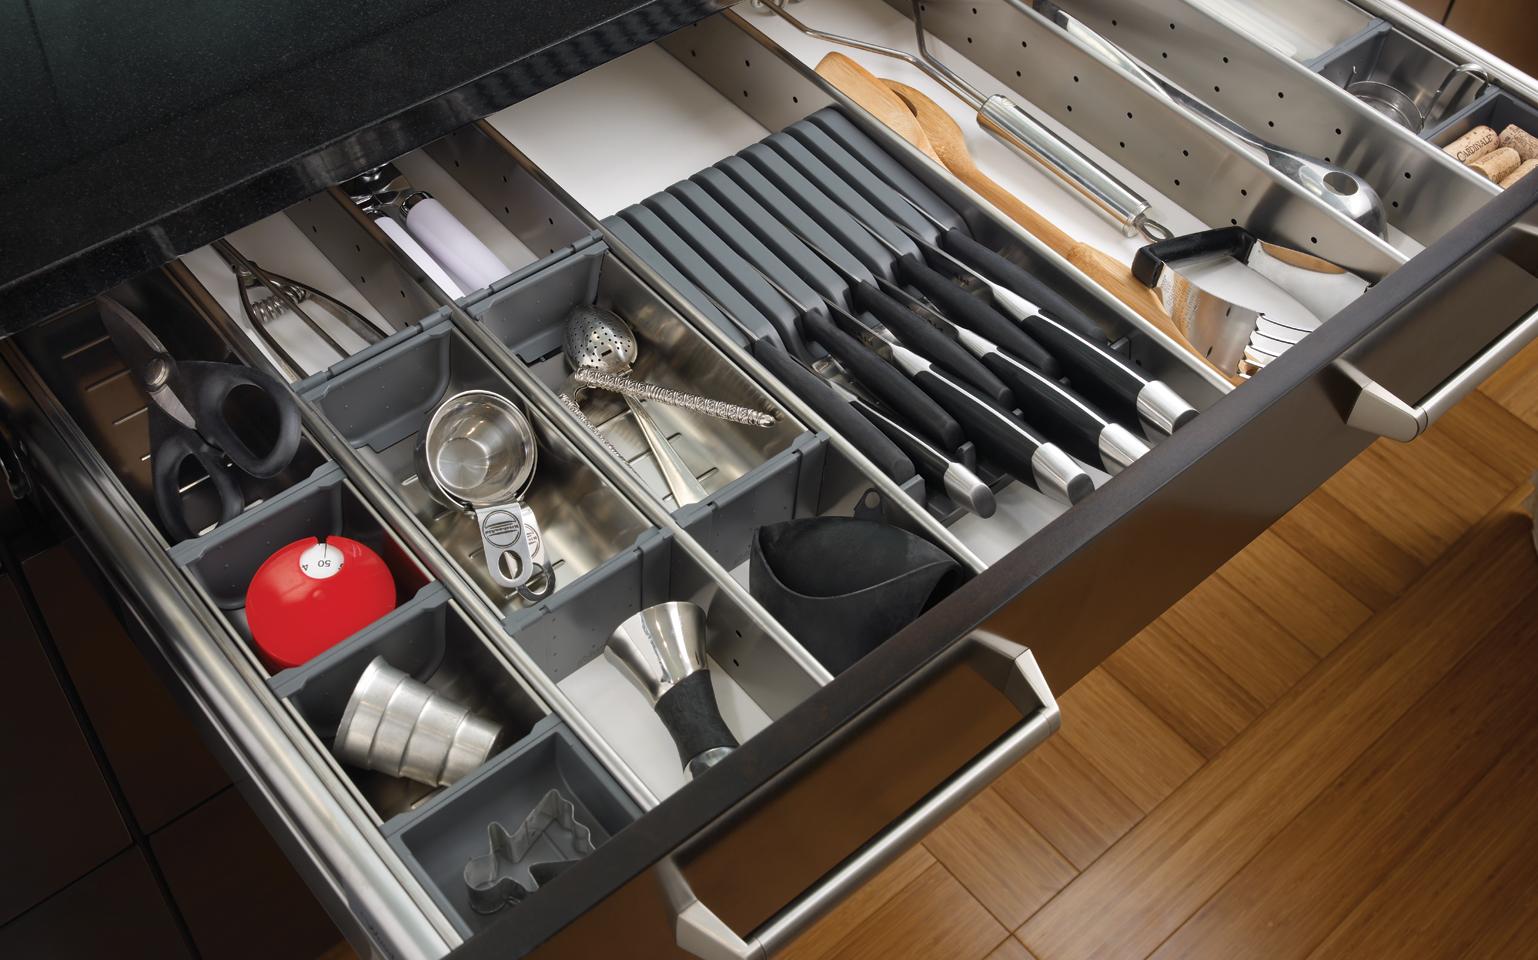 kitchen utensil drawer organizer remodeling open living room solutions for remodels | sabine's new house